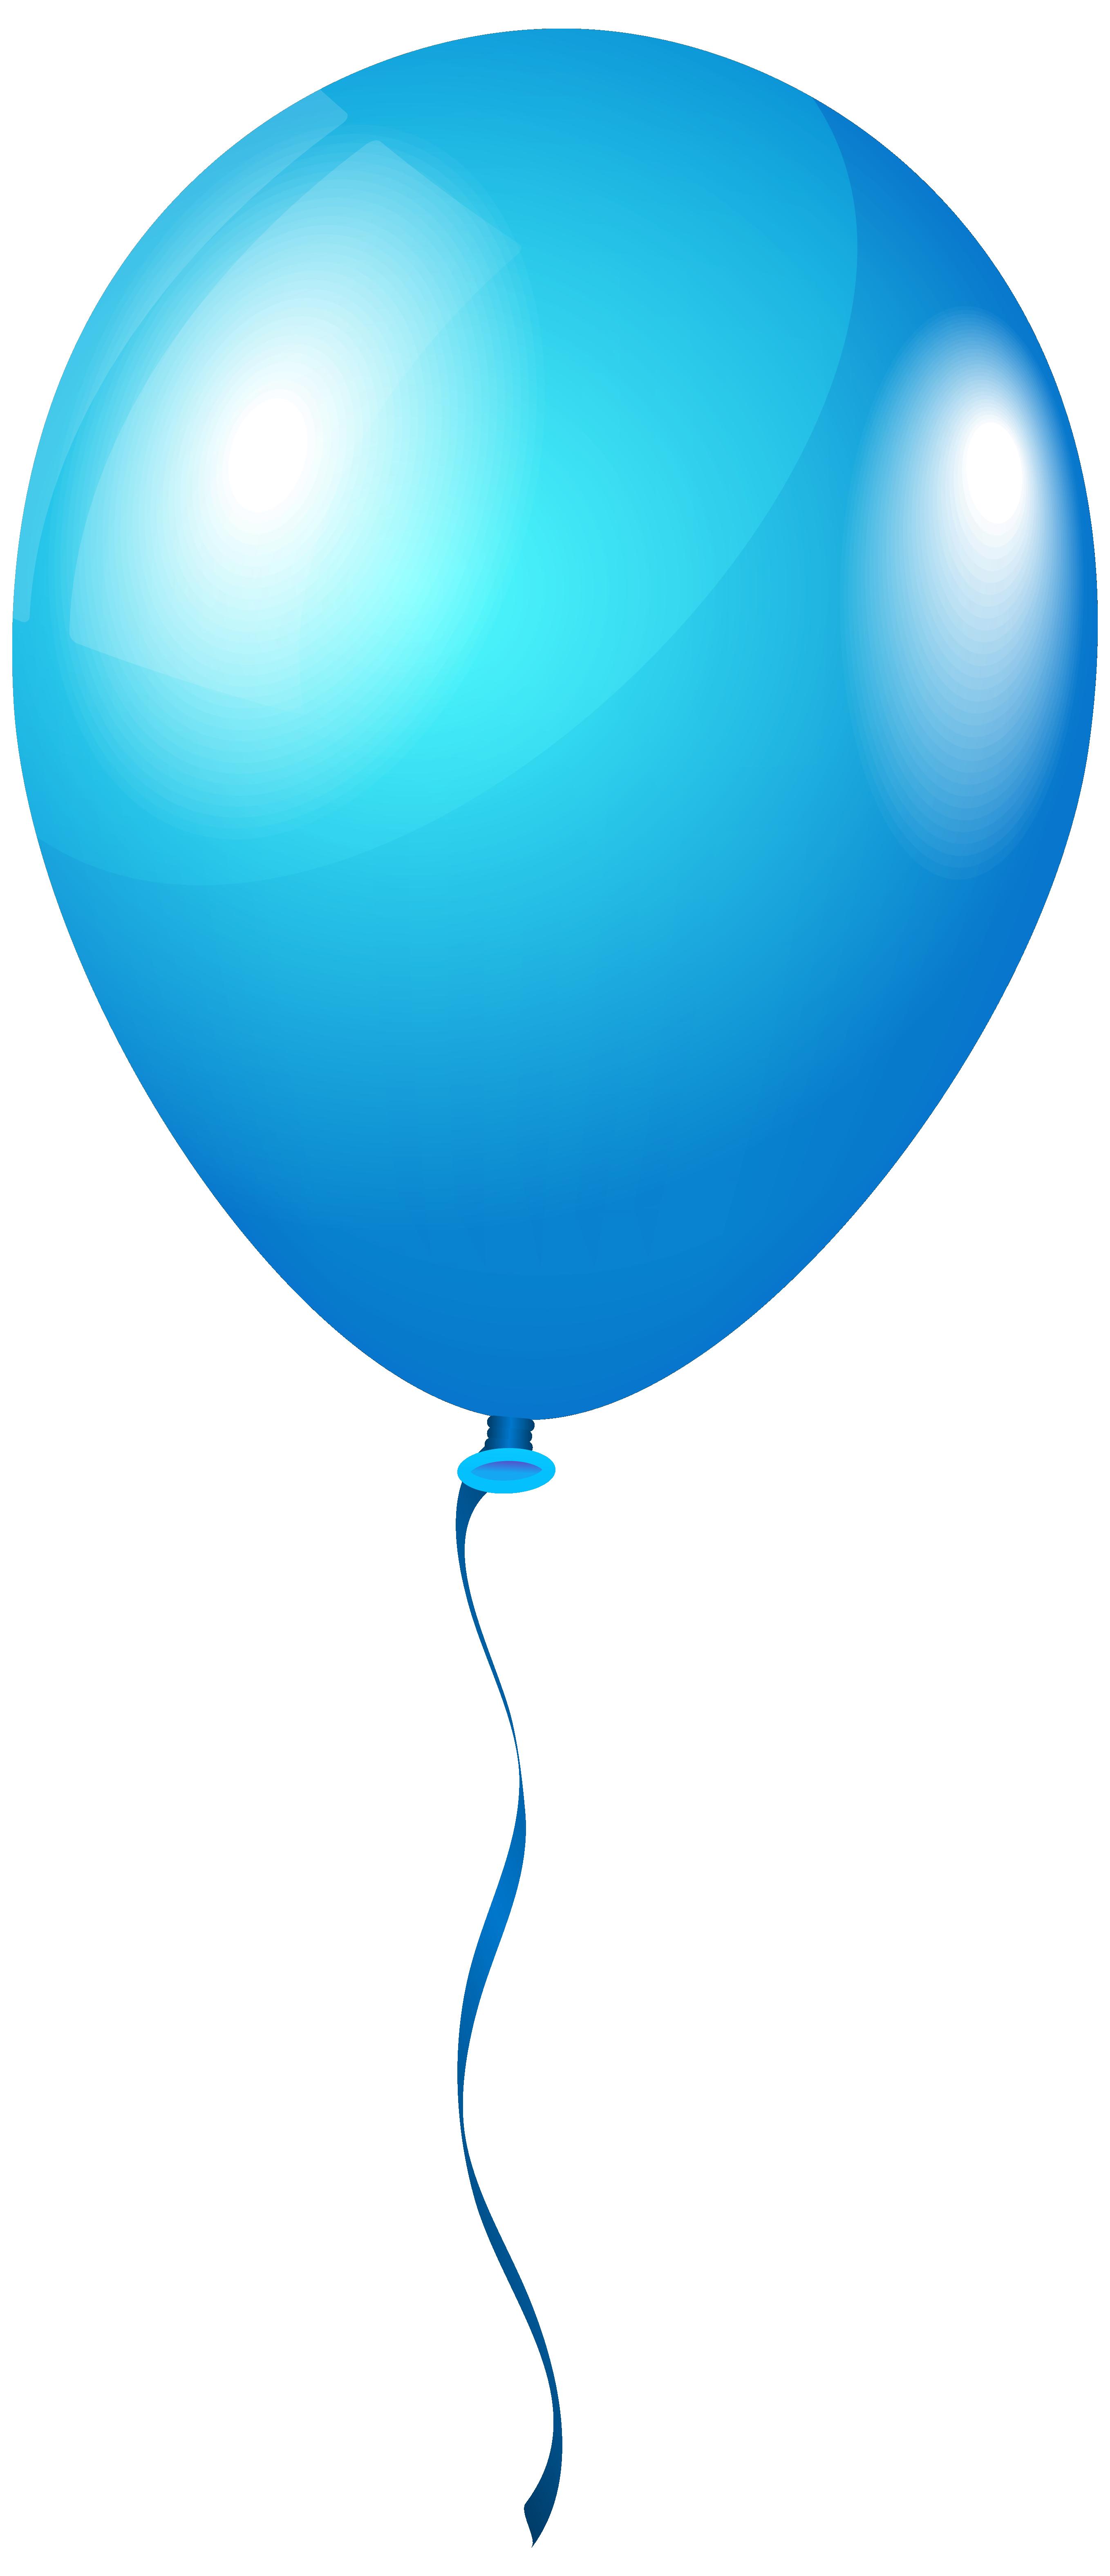 2716x6301 Single Blueballoon Png Clipart Imageu200b Gallery Yopriceville